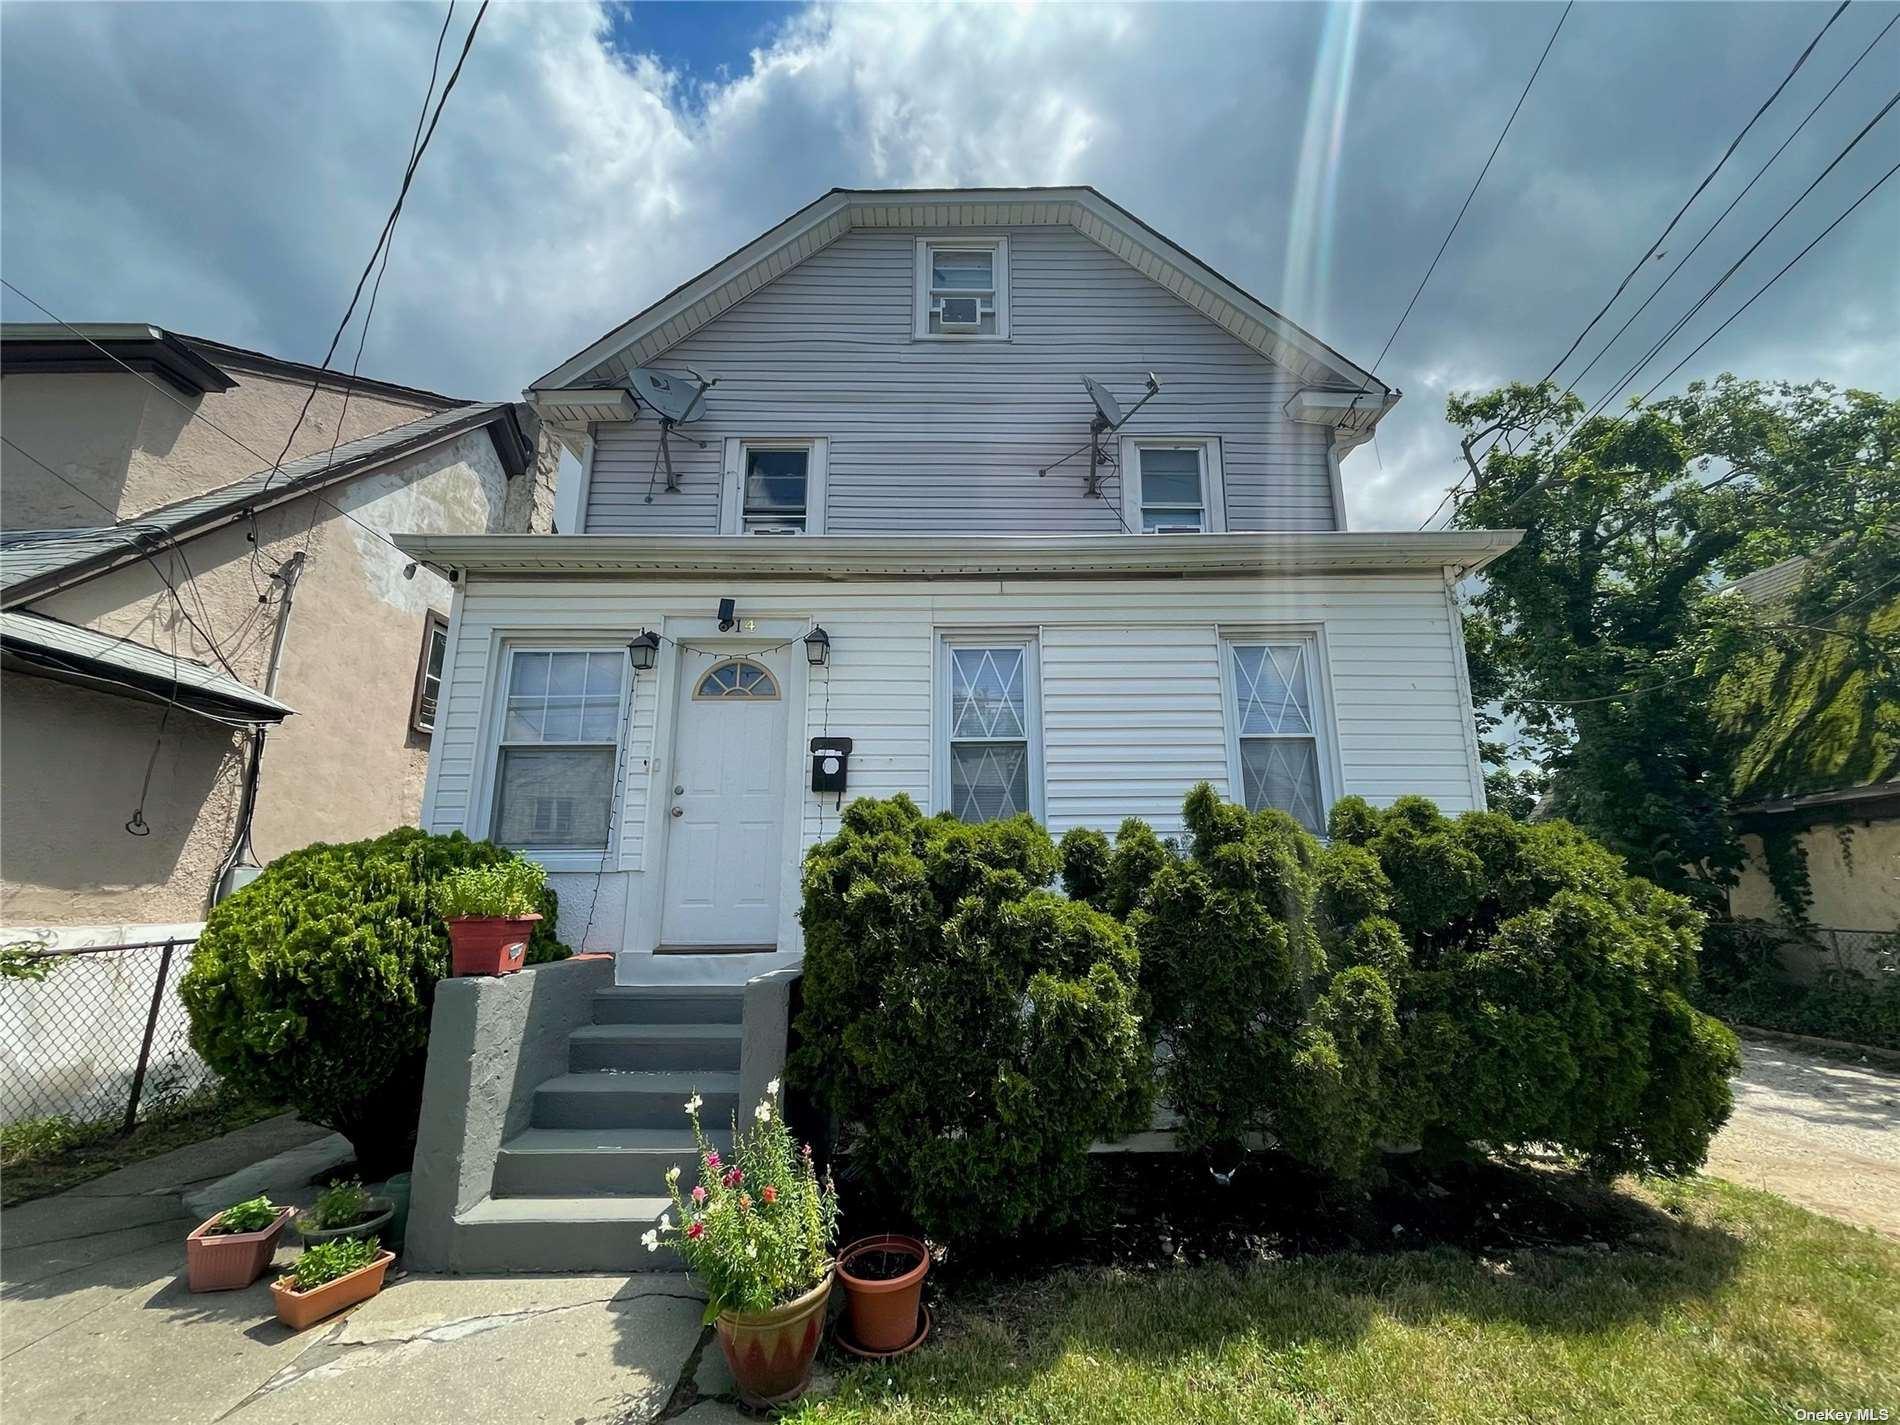 14 W End Avenue, Inwood, NY 11096 - MLS#: 3326996